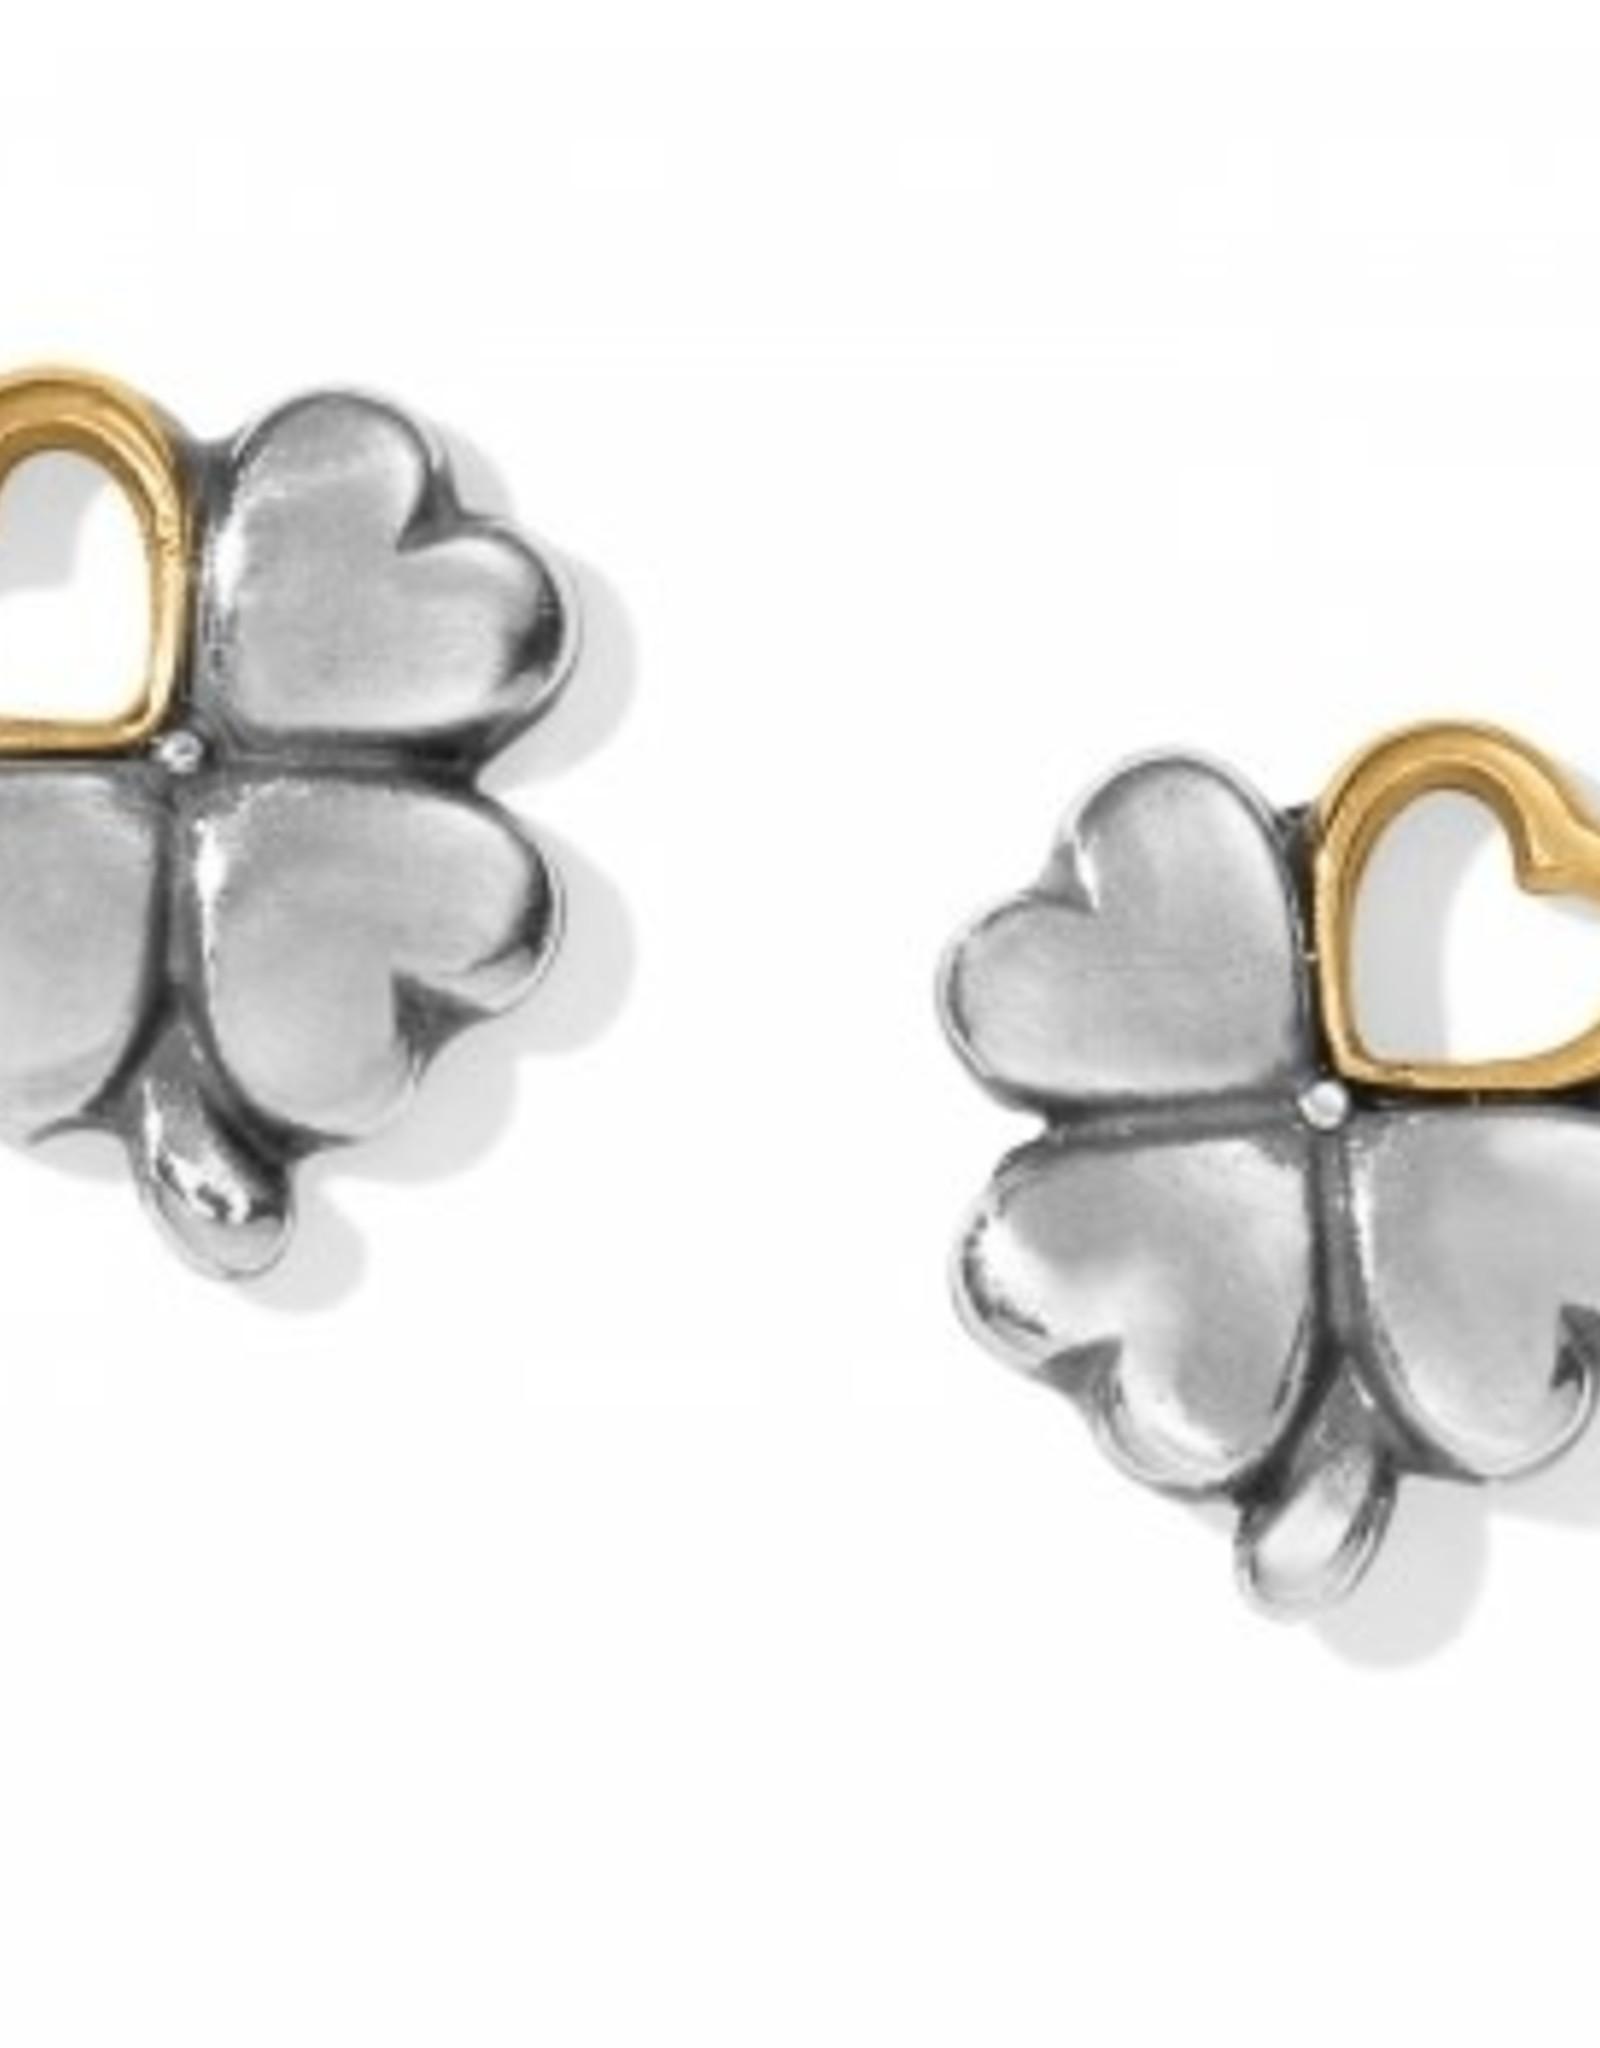 Brighton Brighton, Clover Heart Mini Post Earrings, Silver-Gold